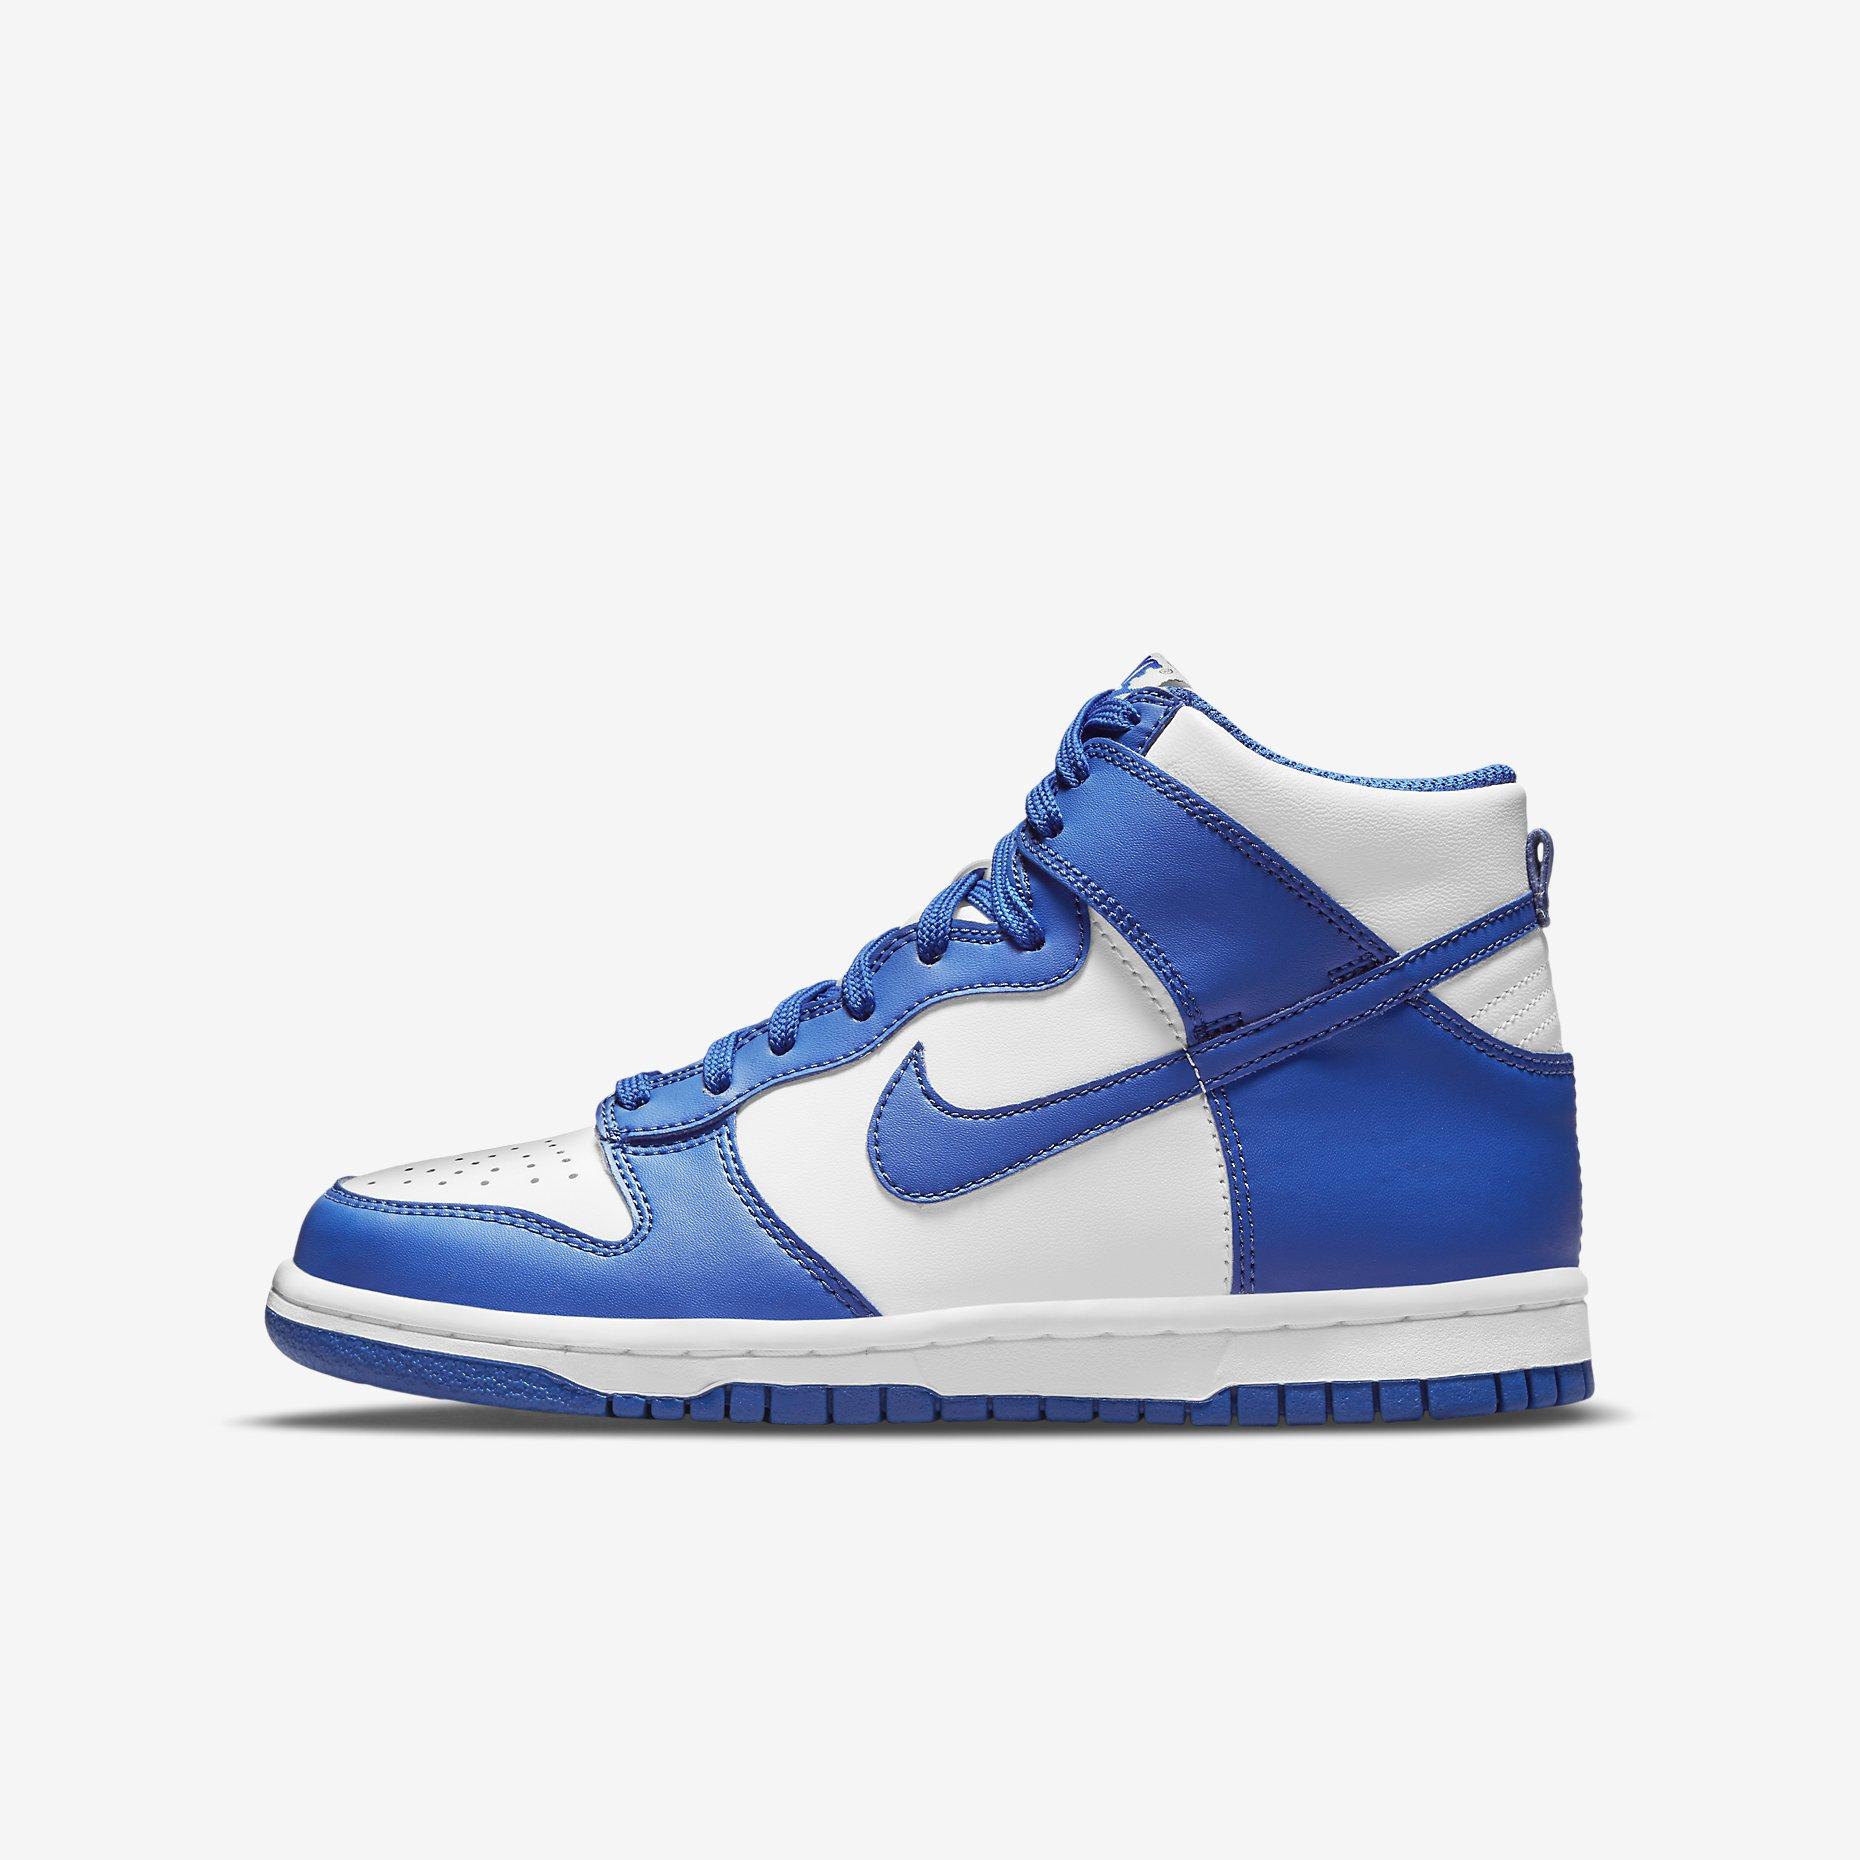 Nike Dunk High GS 'Game Royal'